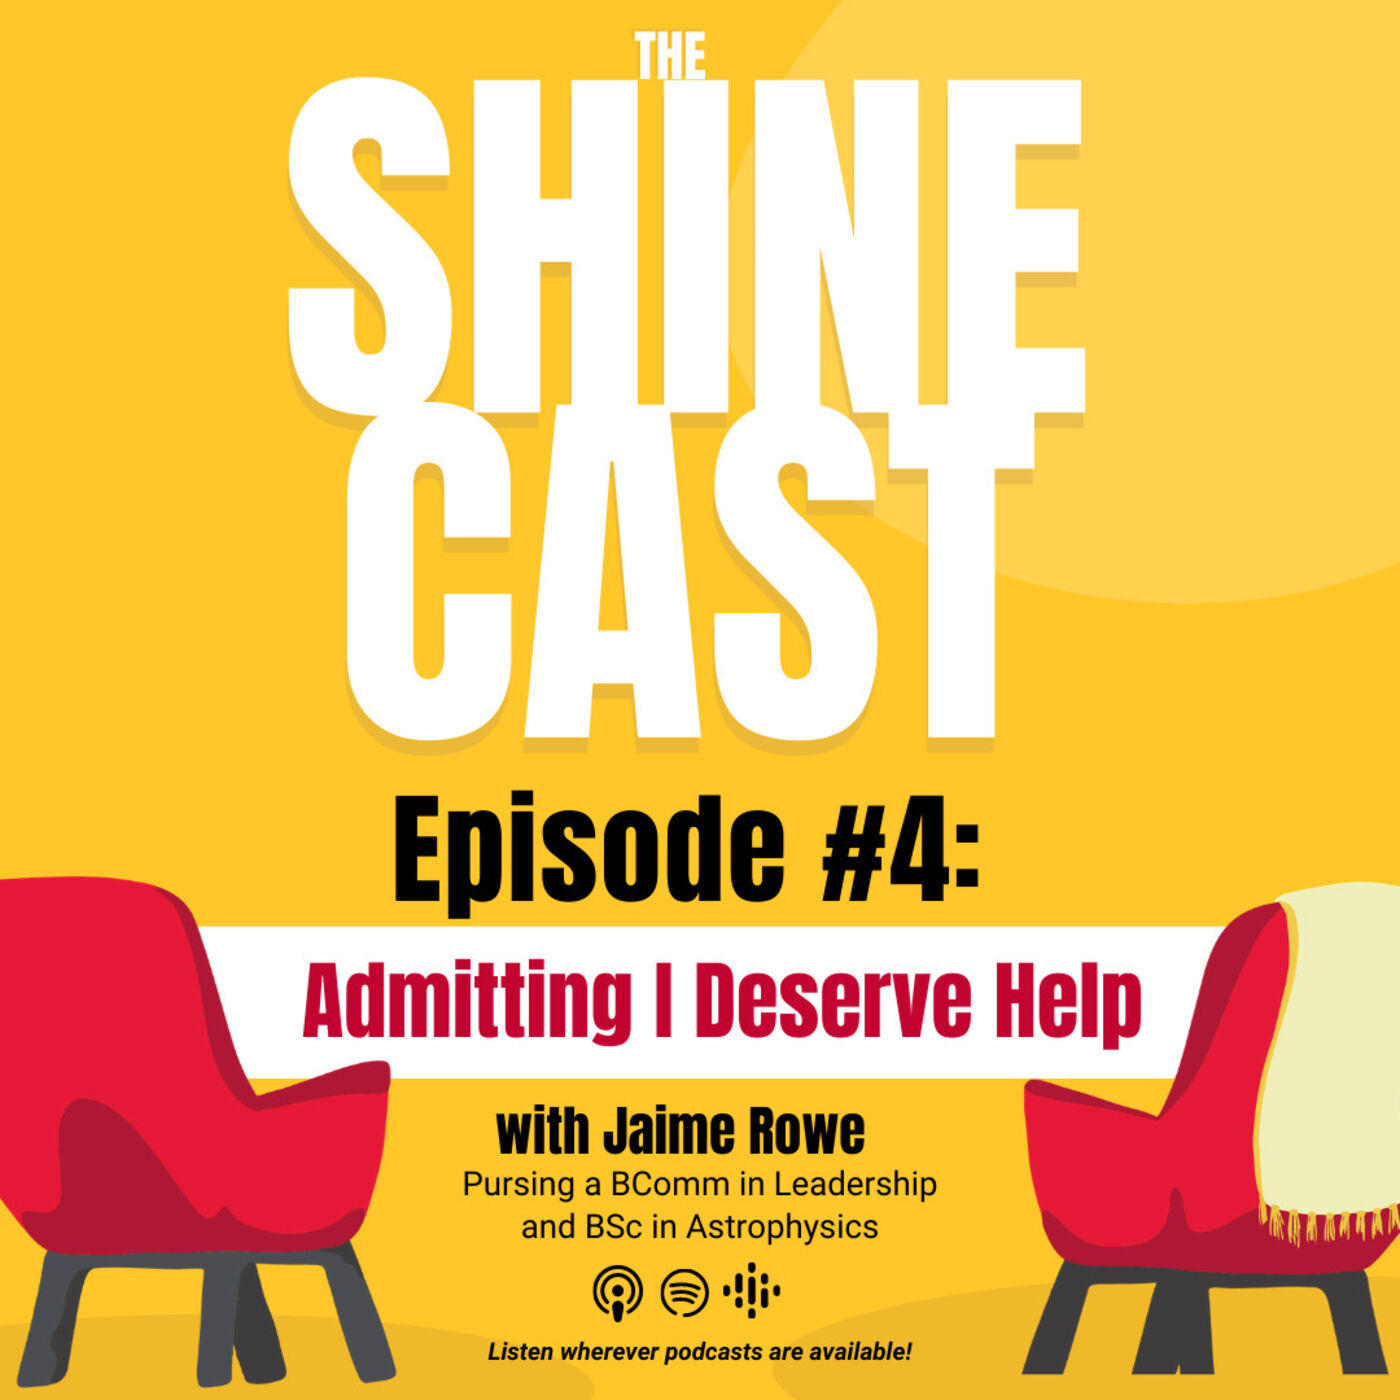 Episode 4: Jaime - Admitting I Deserve Help